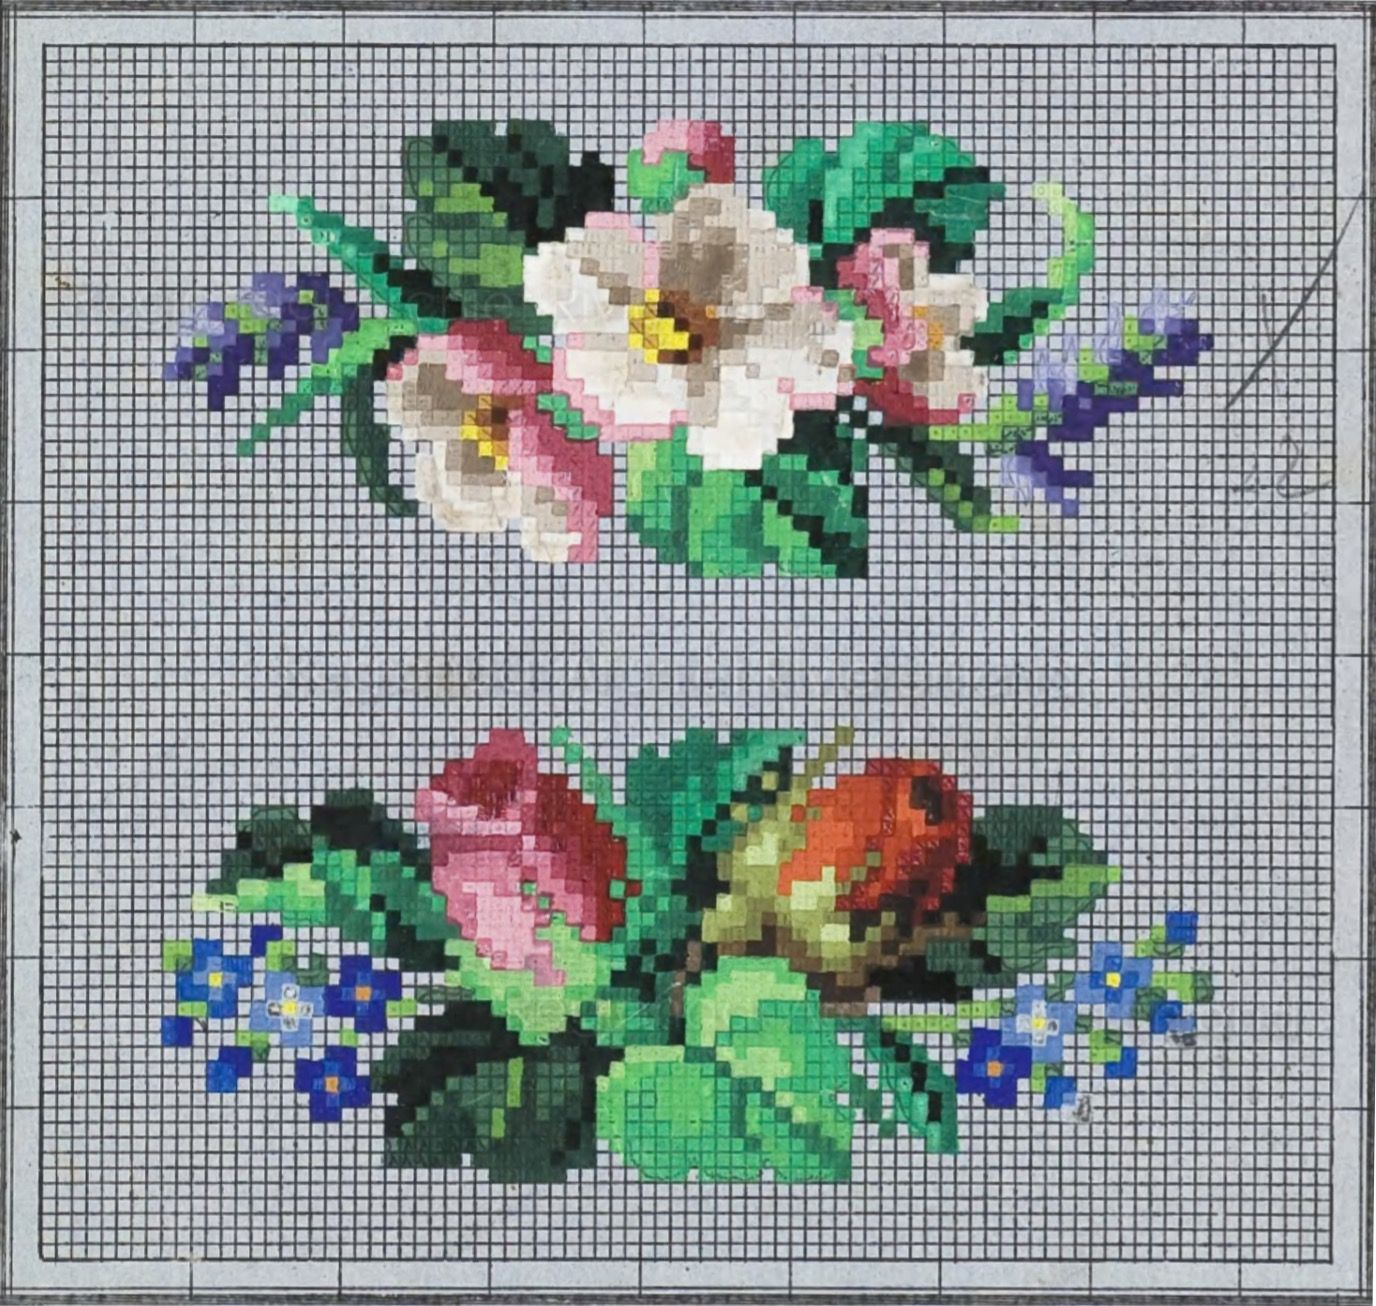 Pin by Инесса Абрамова on berlin woolwork pattern pinterest patterns